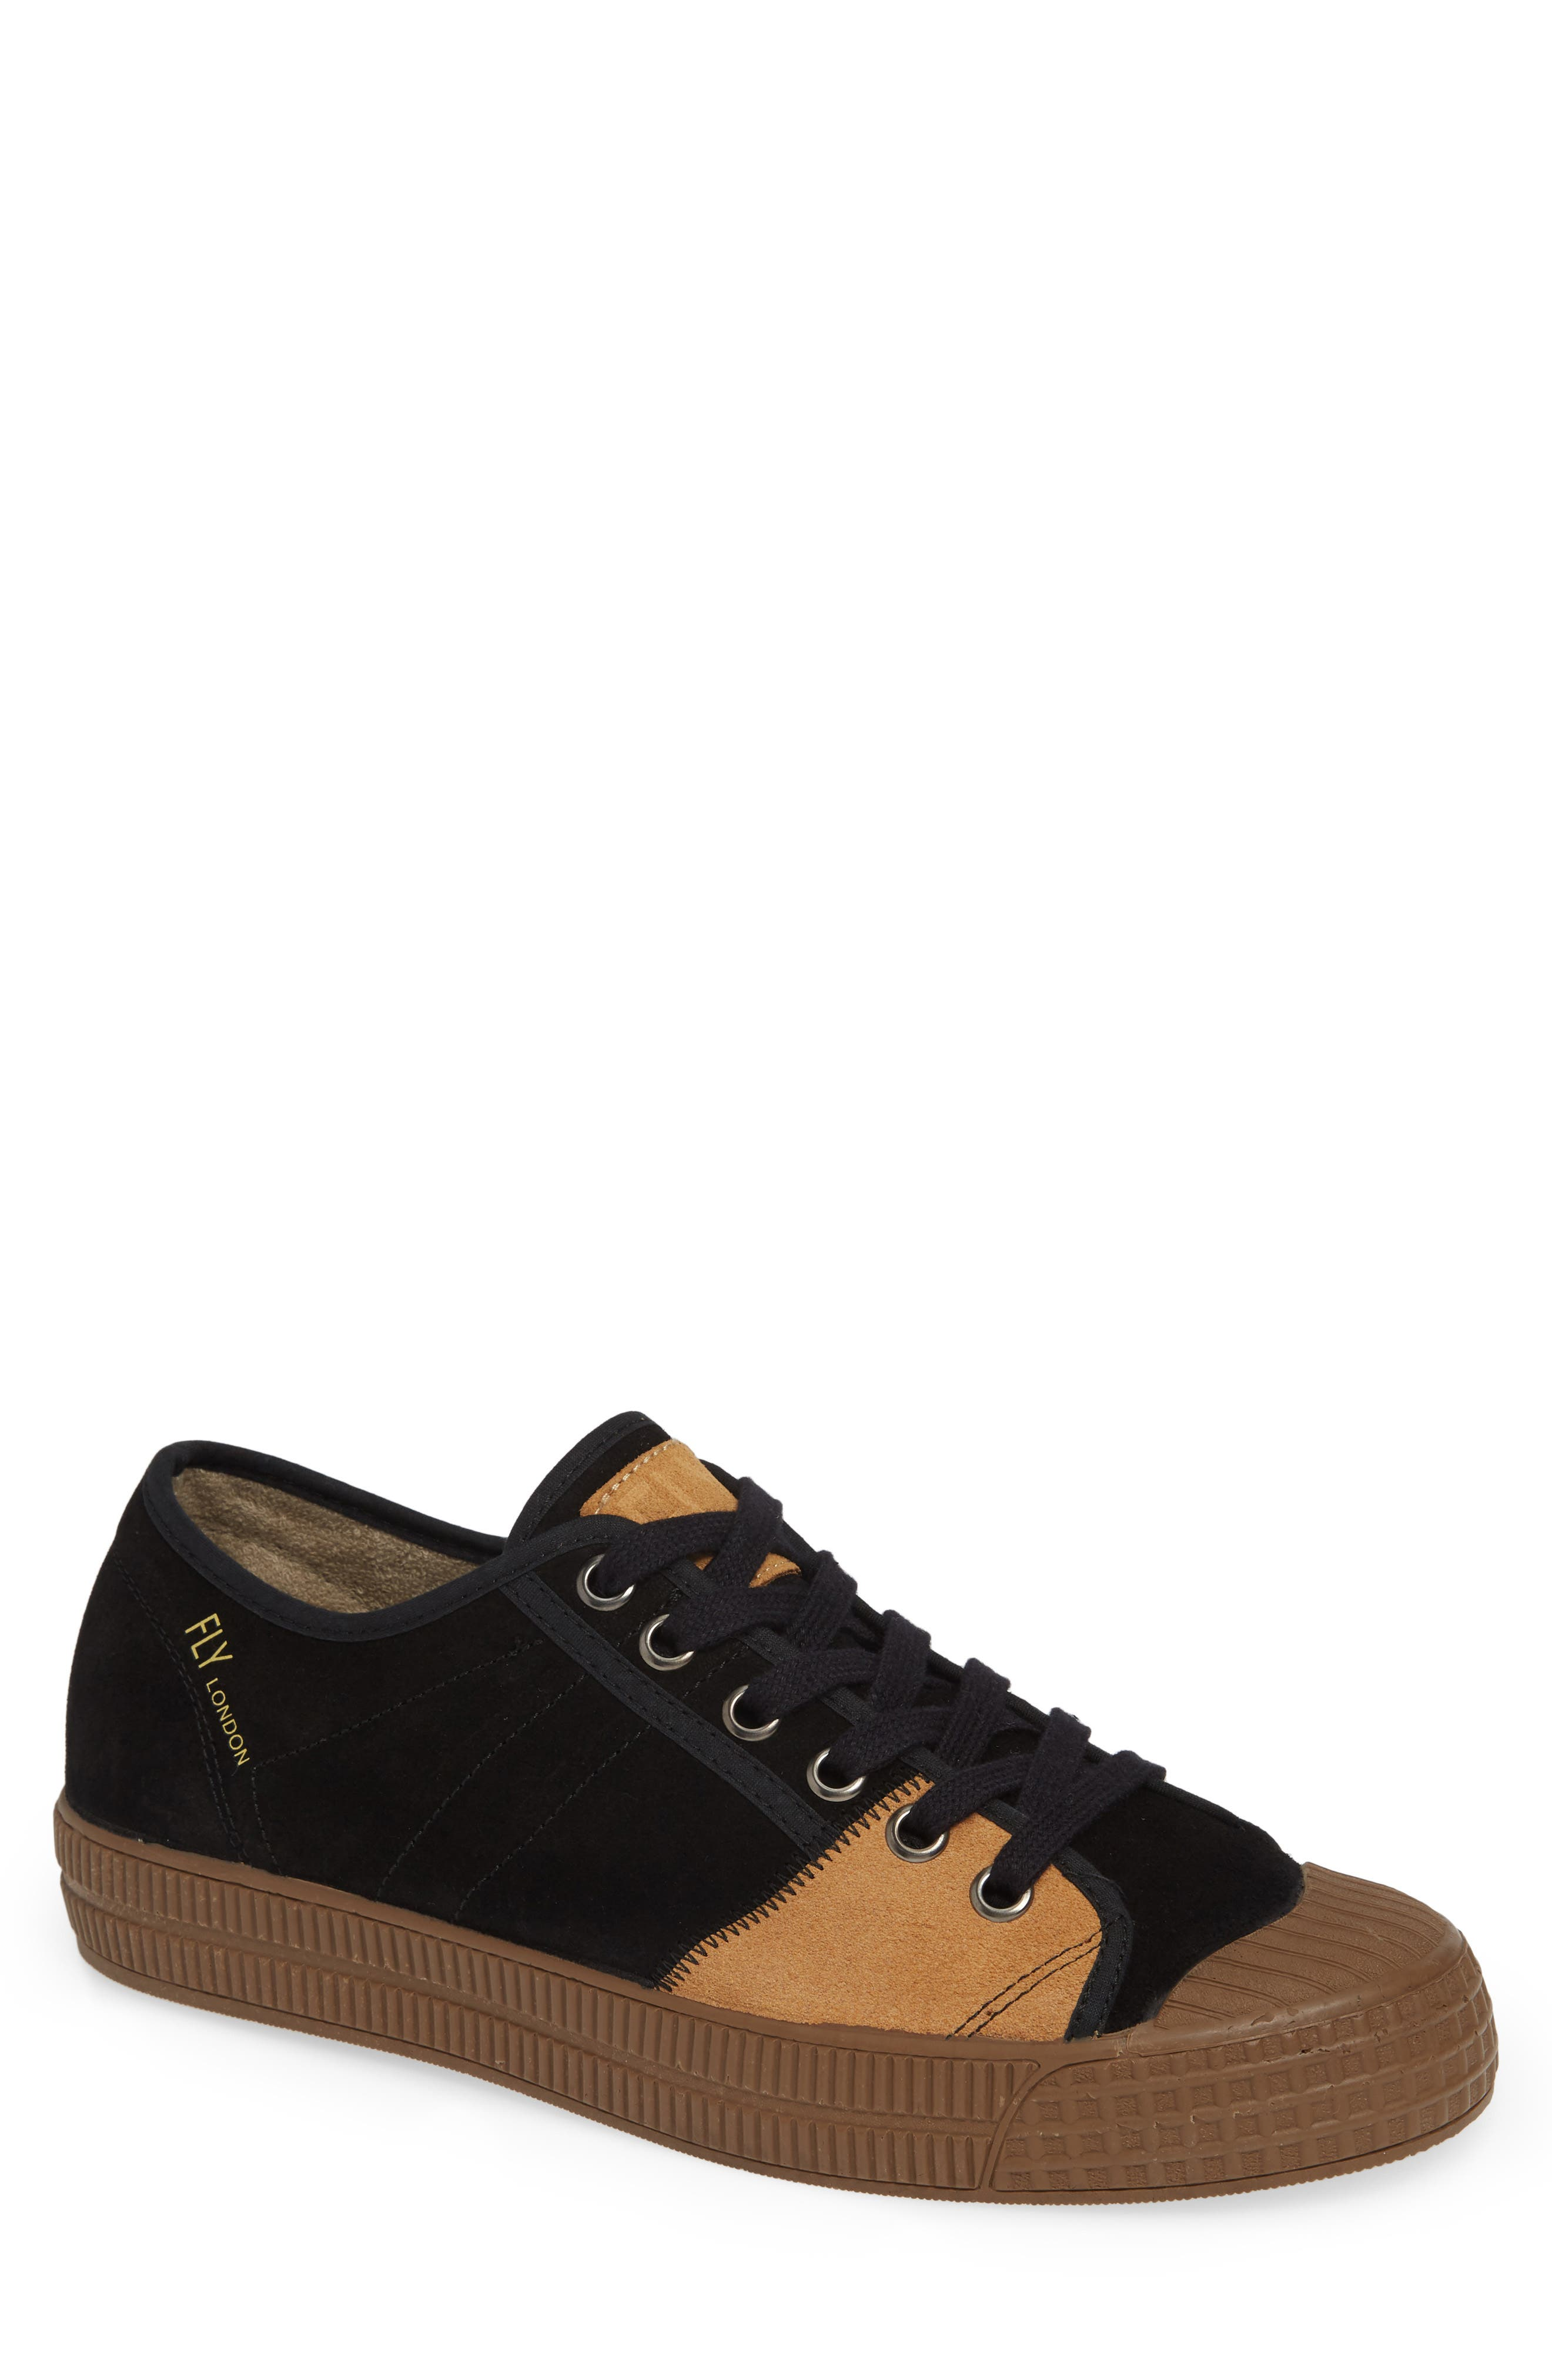 Foto Sneaker,                             Main thumbnail 1, color,                             BLACK/ CAMEL SUEDE